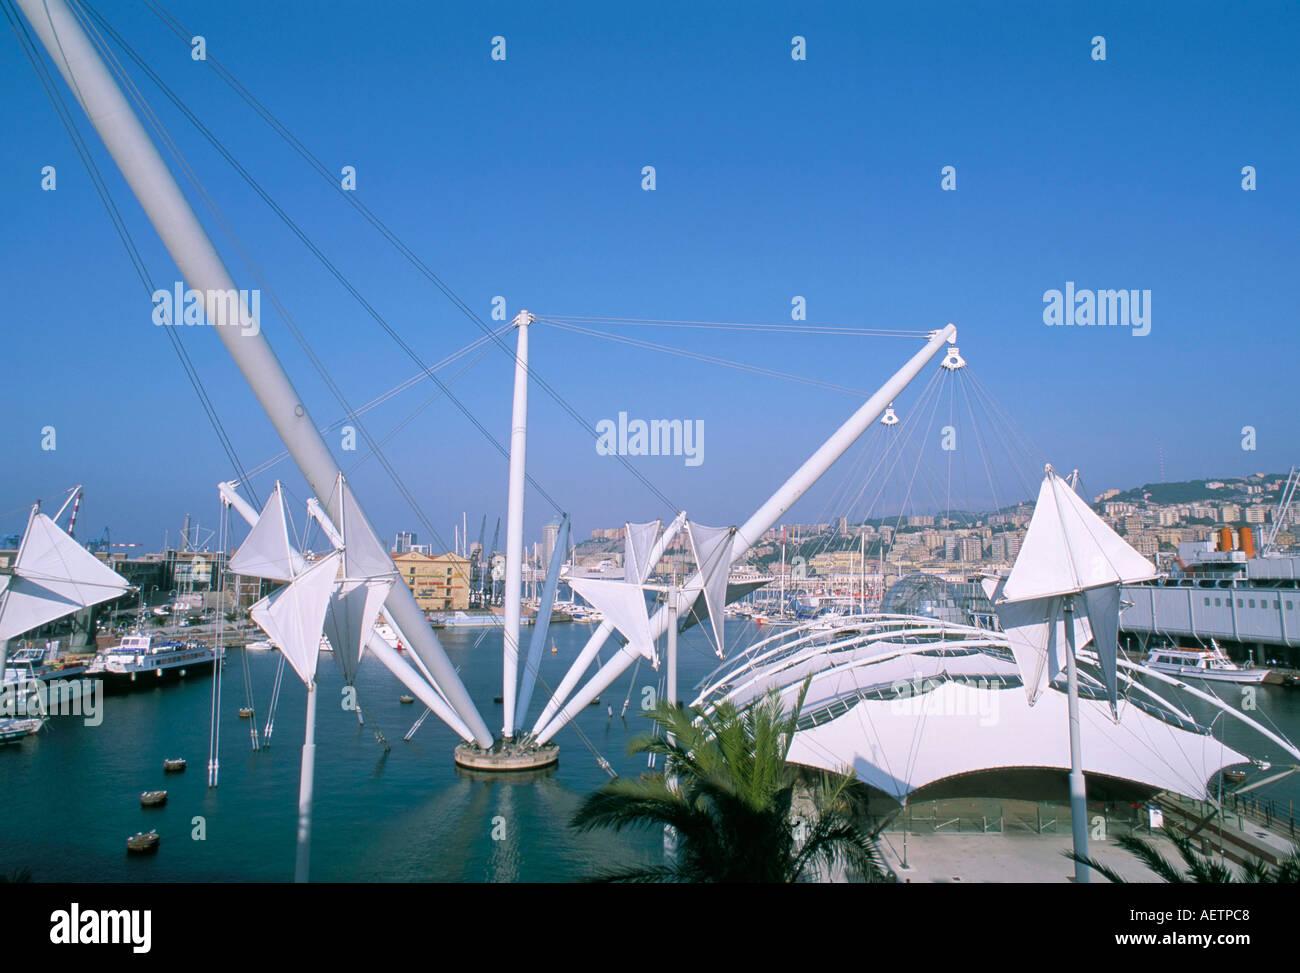 Bigo by Renzo Piano Porto Antico port area Genoa Genova Liguria Italy Europe - Stock Image